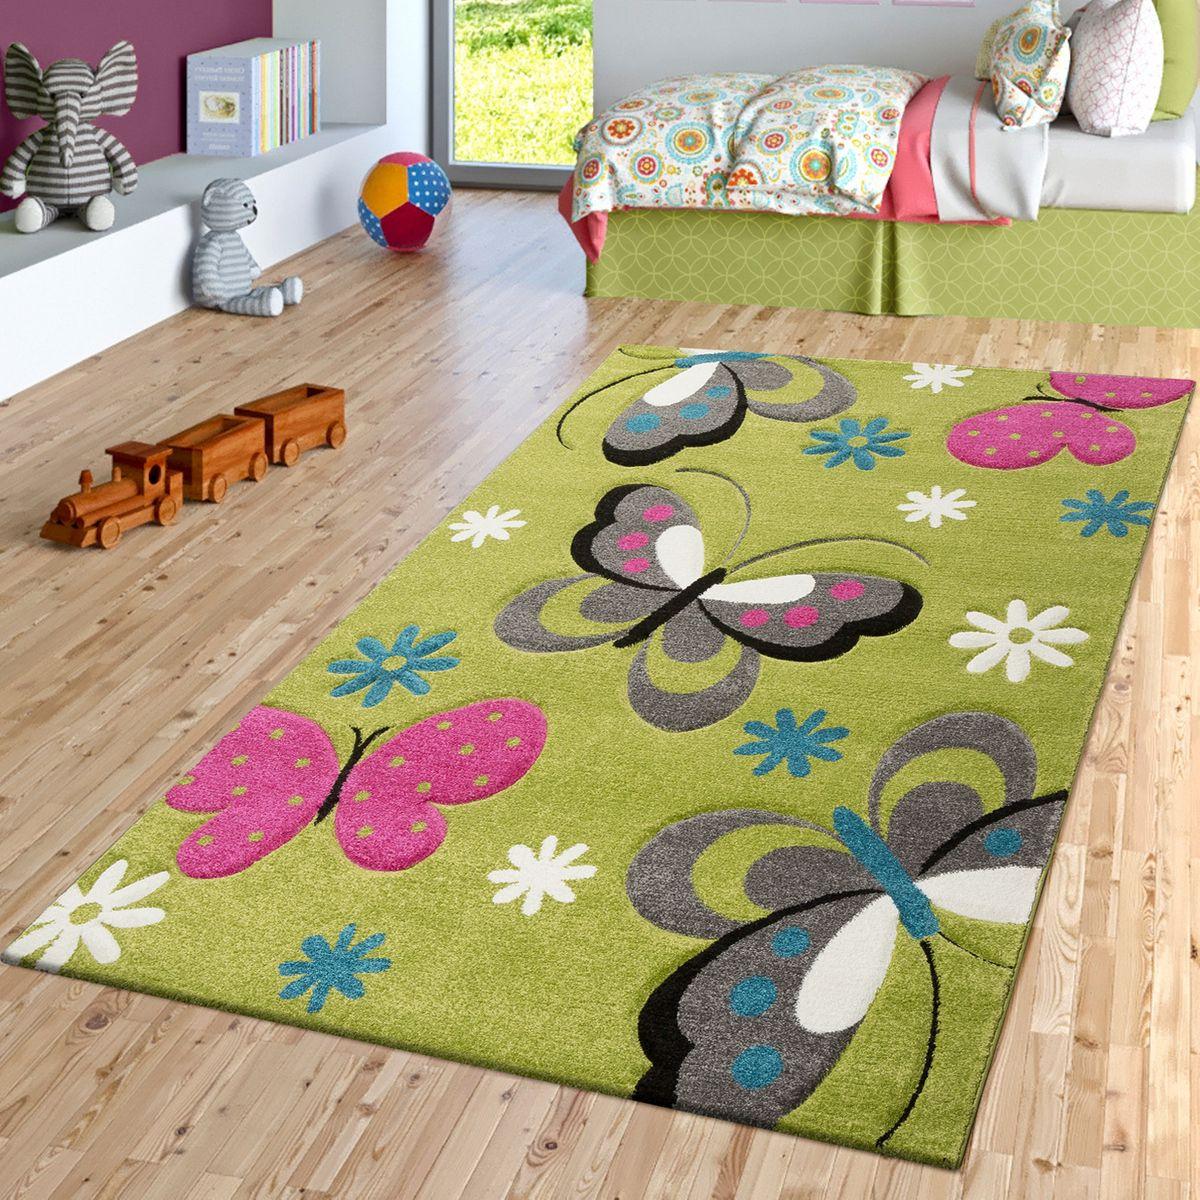 Full Size of Schmetterling Teppich Grn Grau Fuchsia Creme Kinderzimmer Regal Weiß Regale Wohnzimmer Teppiche Sofa Kinderzimmer Kinderzimmer Teppiche